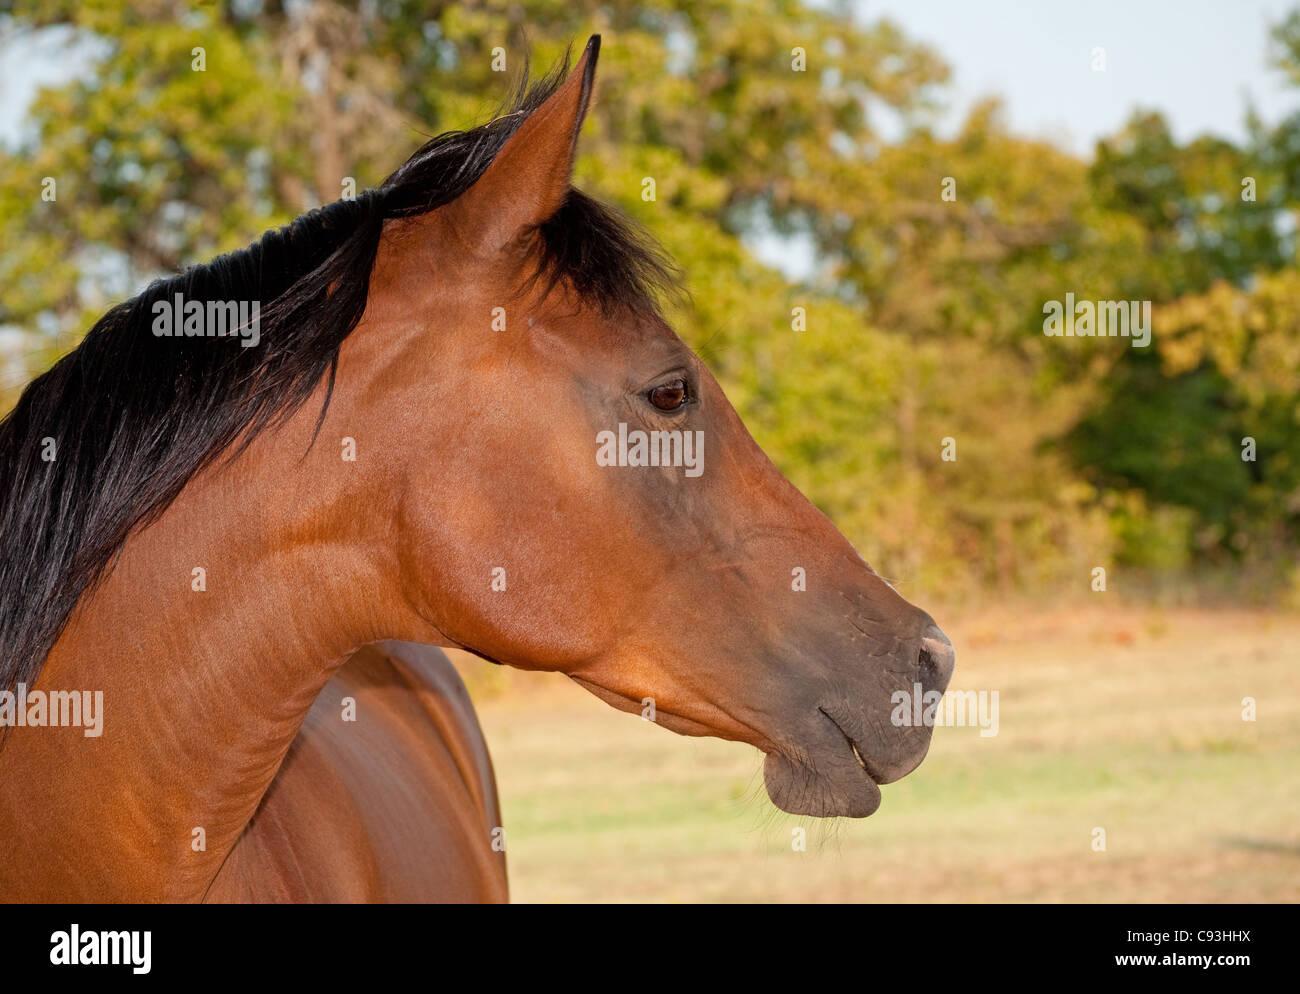 Profile of a beautiful red bay Arabian horse - Stock Image